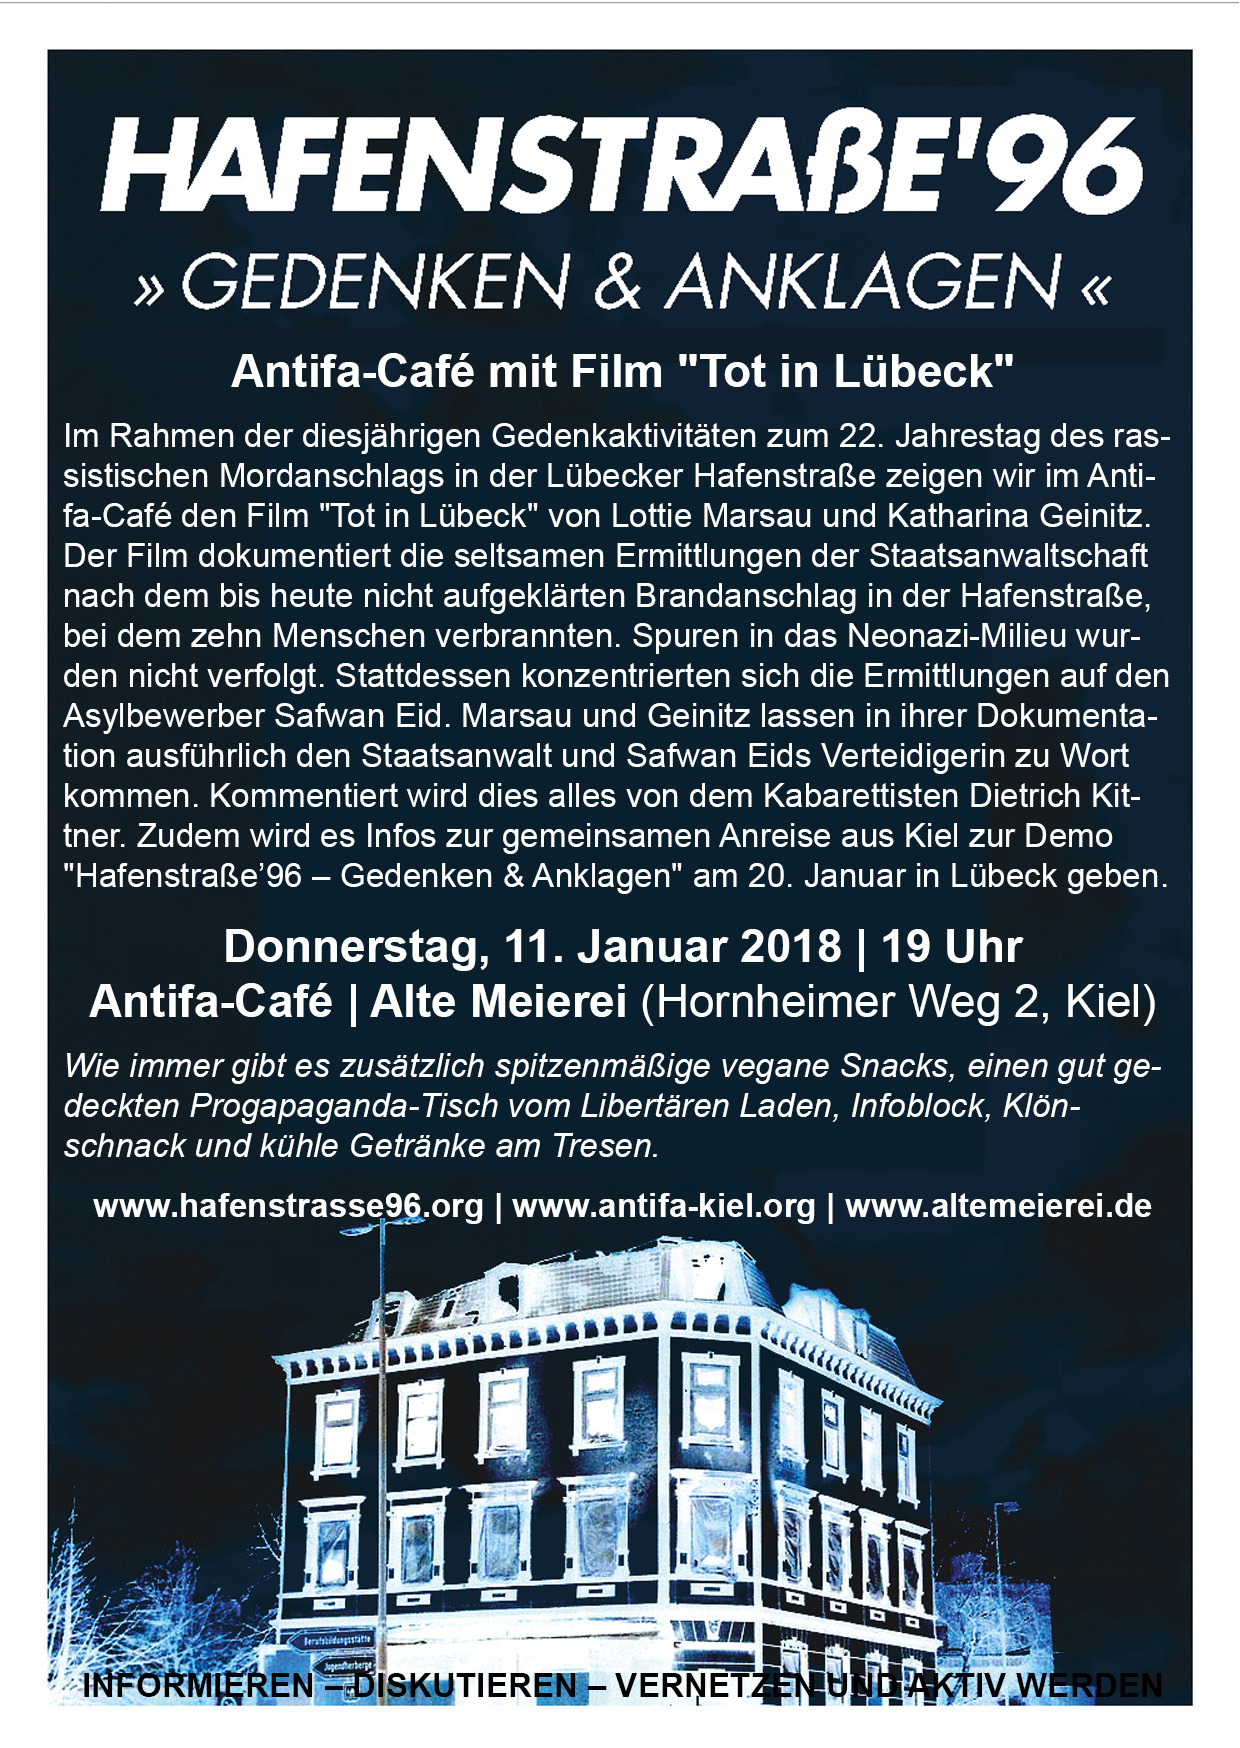 http://www.neu.antifa-kiel.org/wp-content/uploads/import/antifa-cafe/cafe-hlhafenstr.jpg